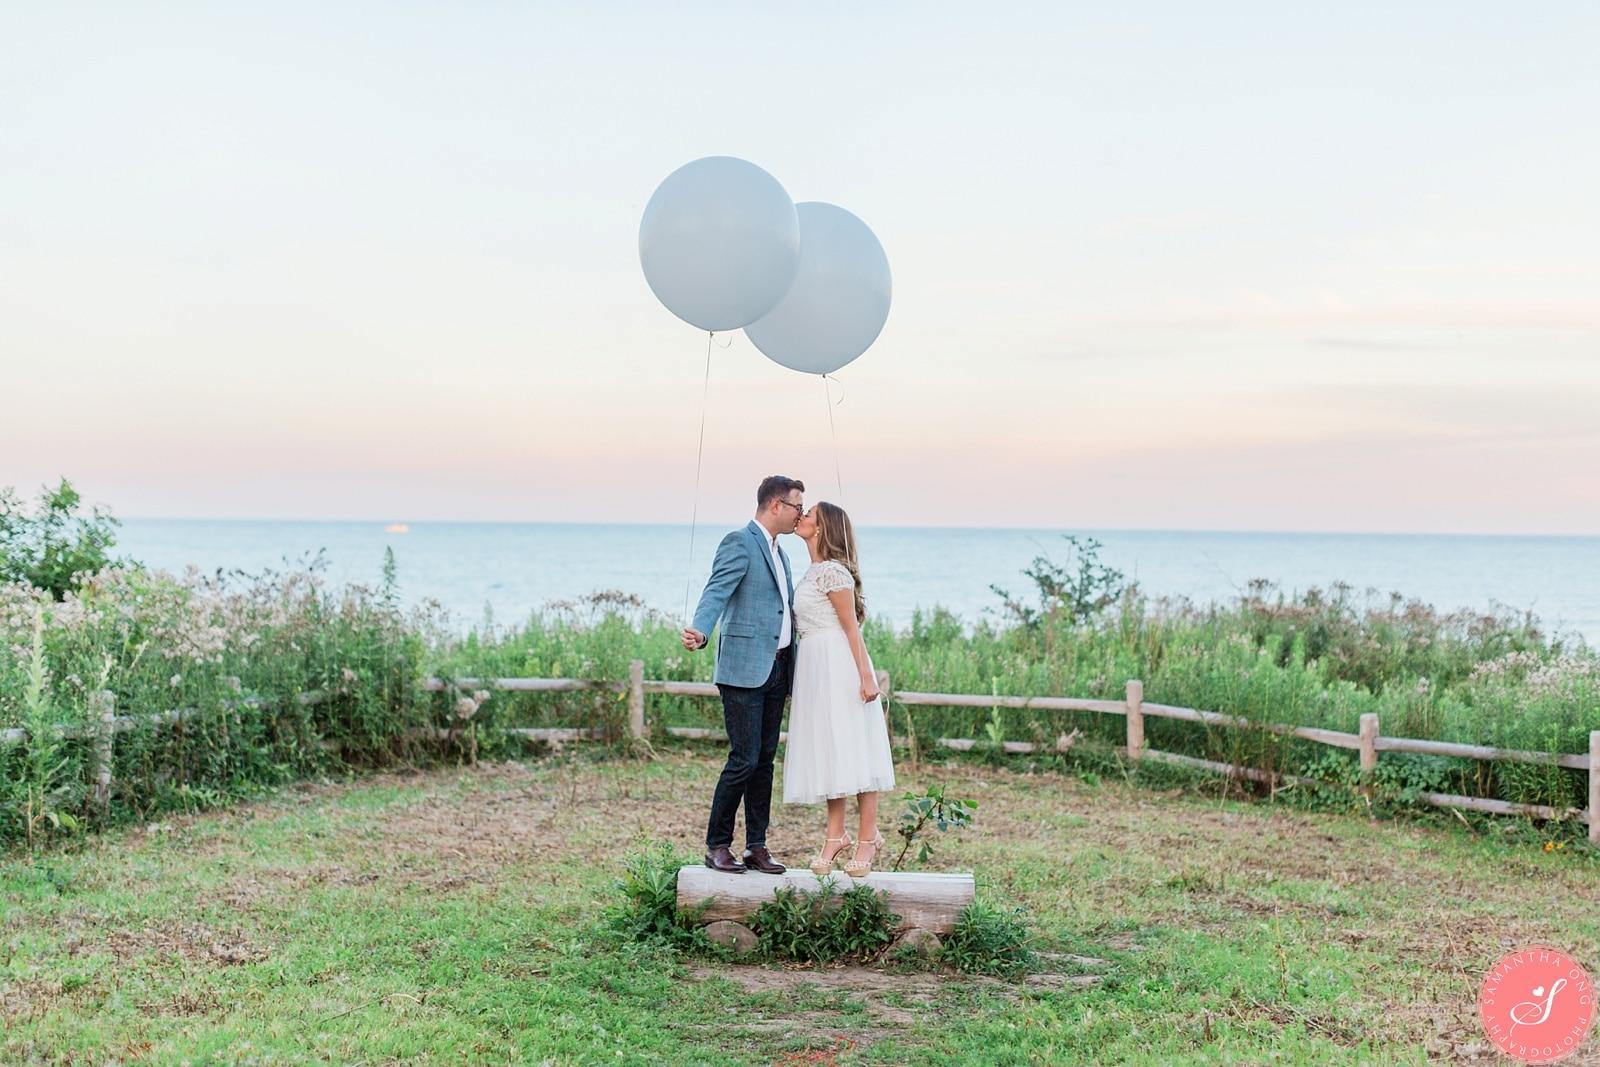 Pickering Engagement Photographer